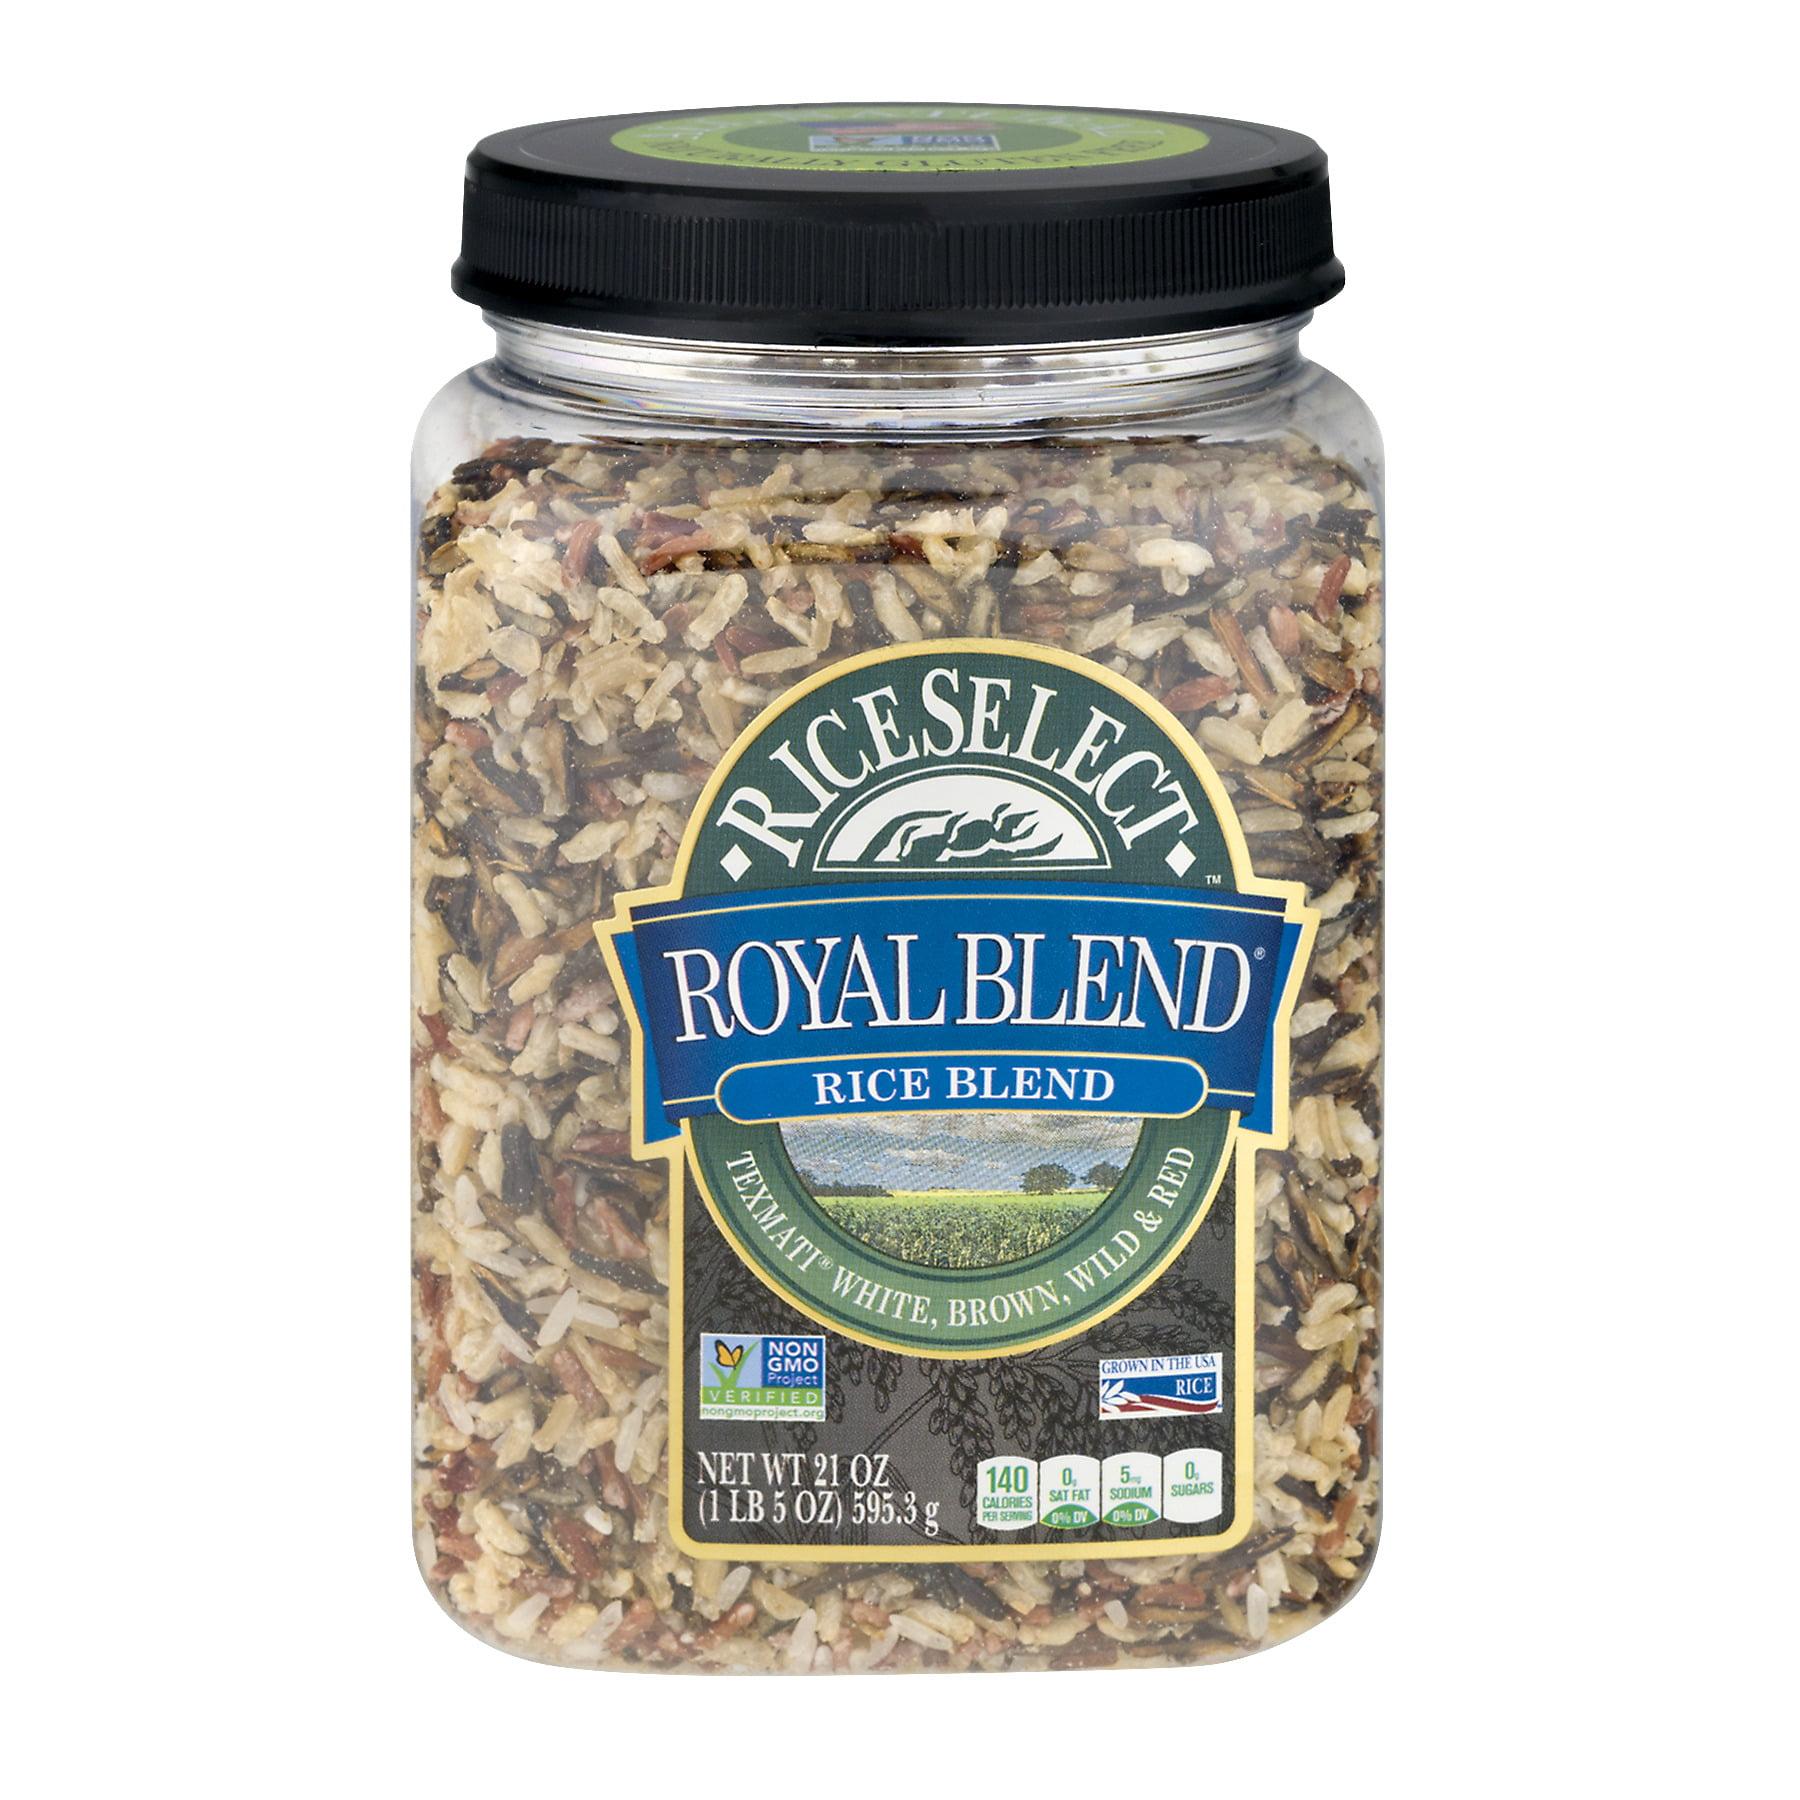 Rice Select™ Texmati® Royal Blend® Rice Blend 21 oz. Jar